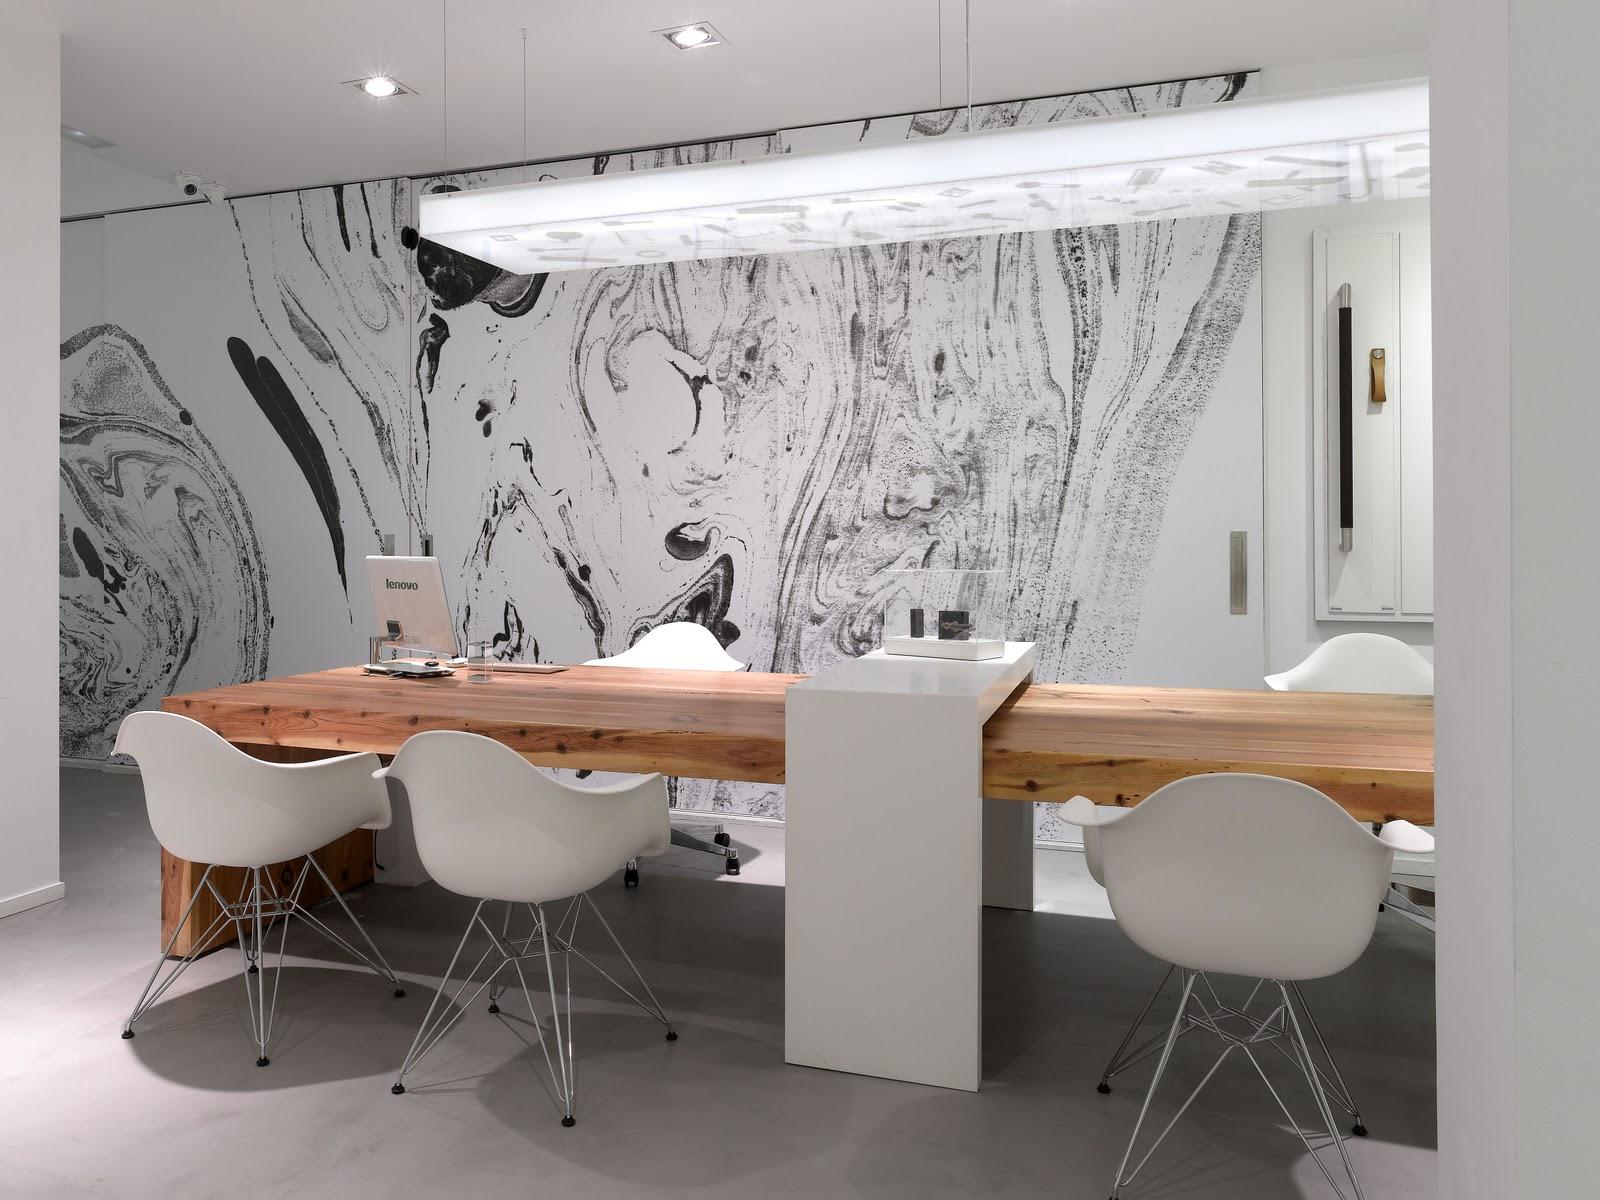 Labores modernas labores modernas para el picaporte de for Imagenes de fachadas de oficinas modernas